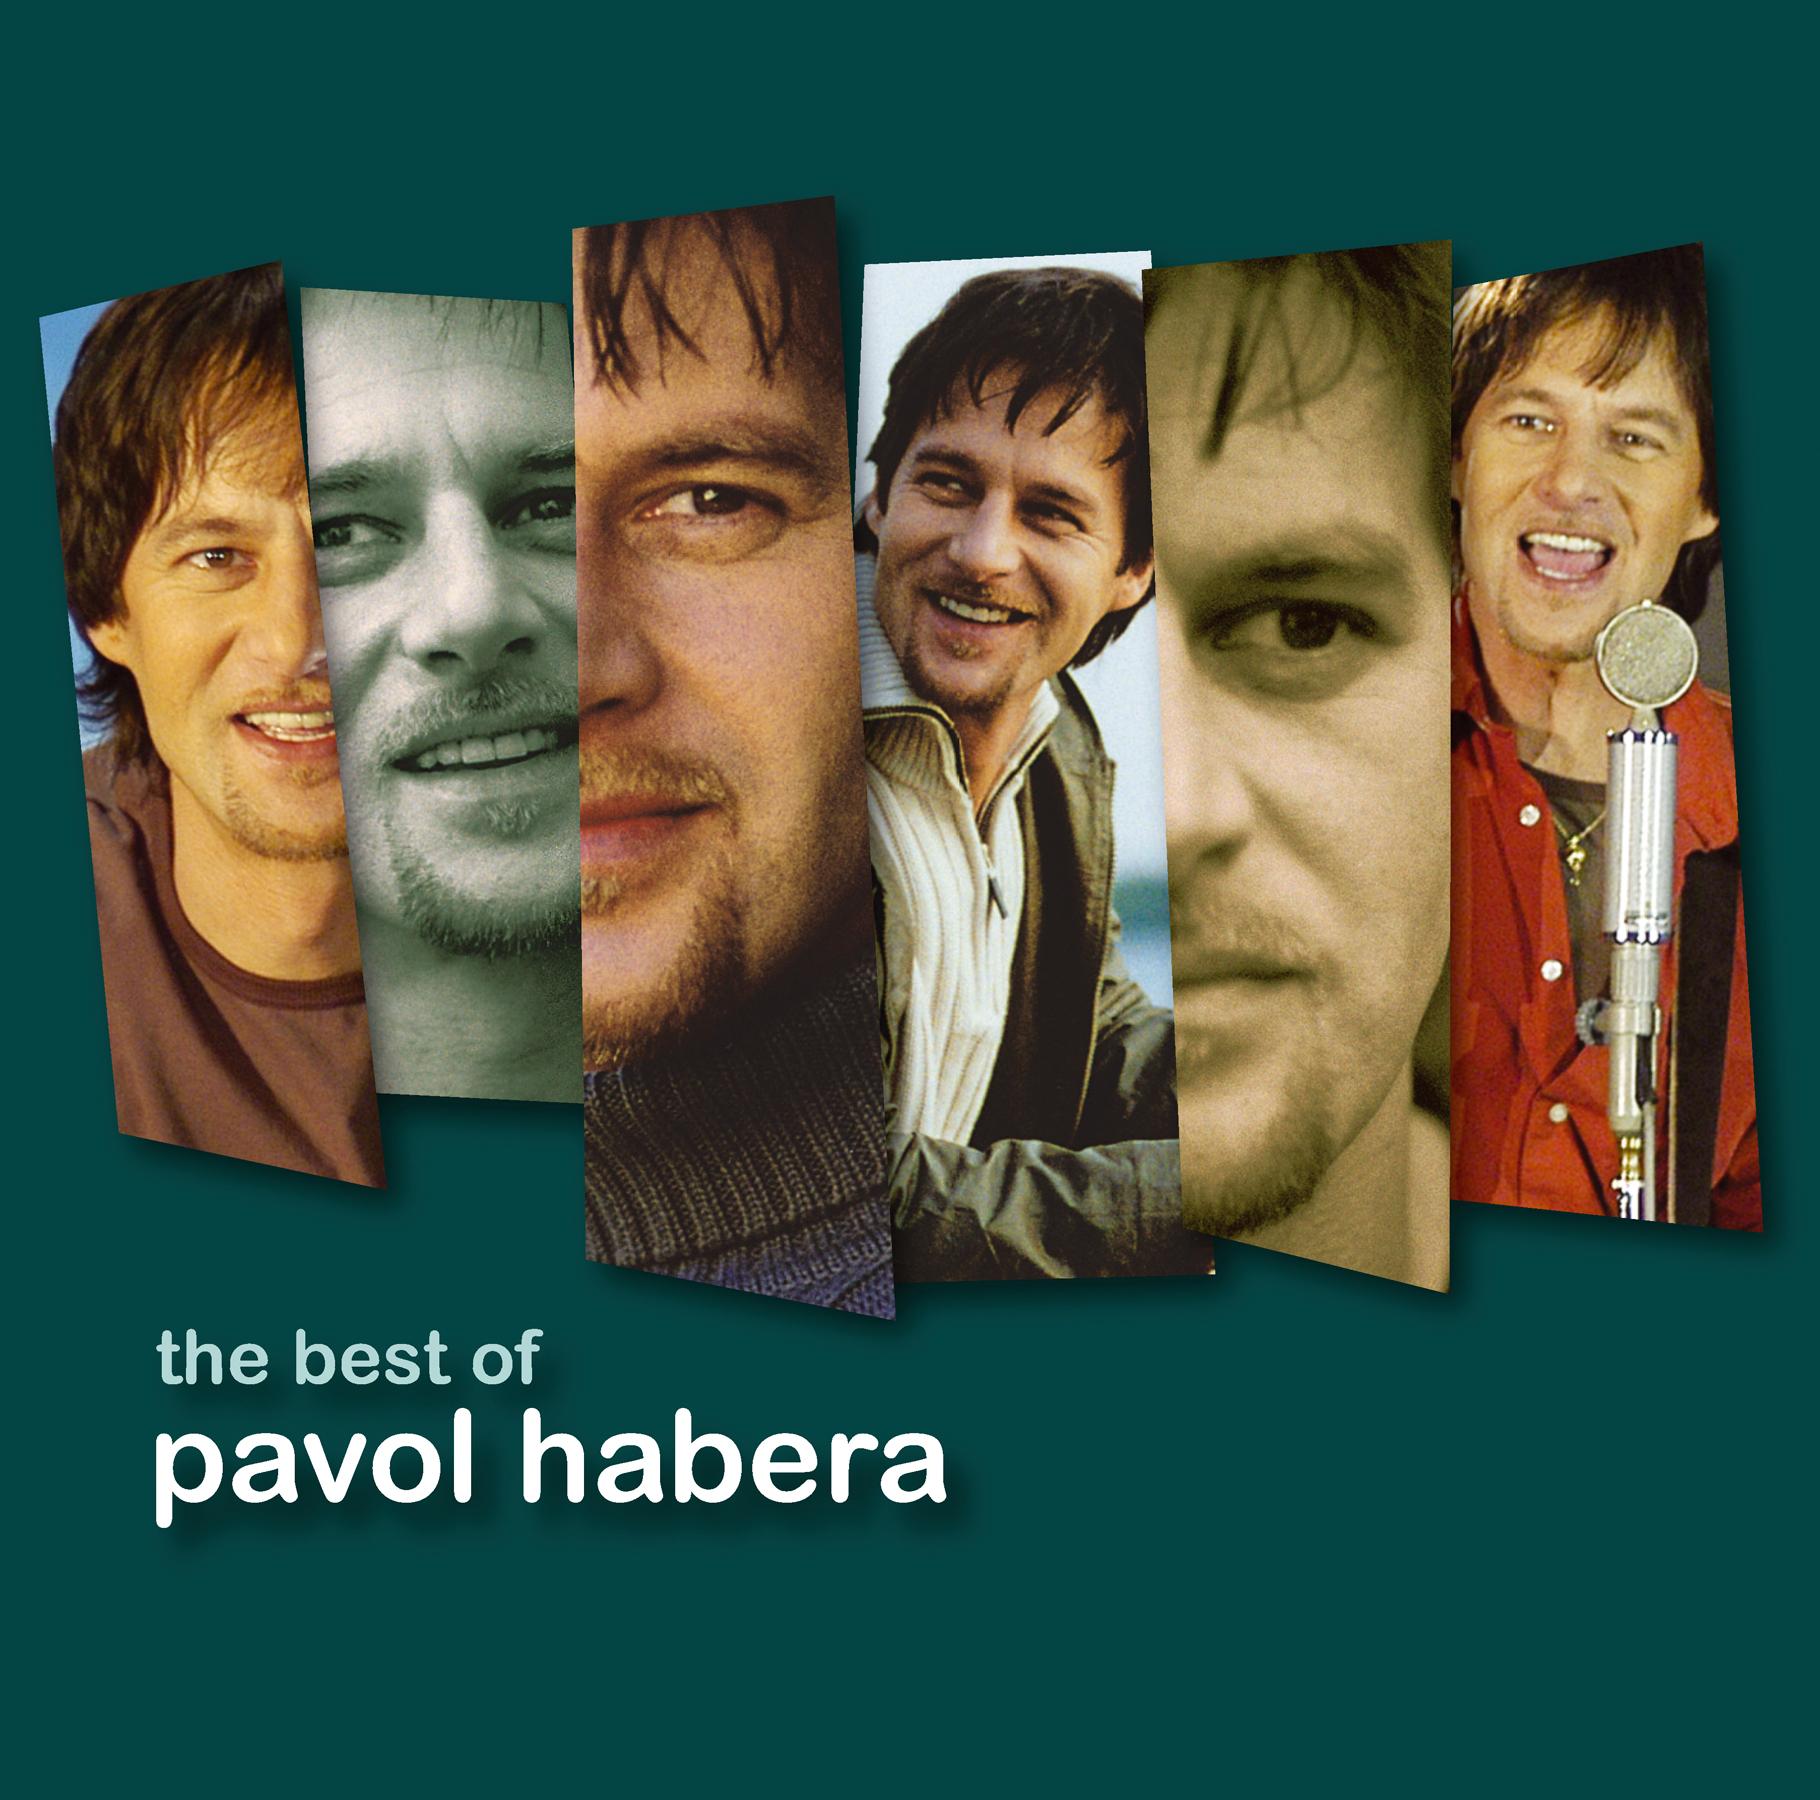 THE BEST OF PAVOL HABERA - supershop.sk